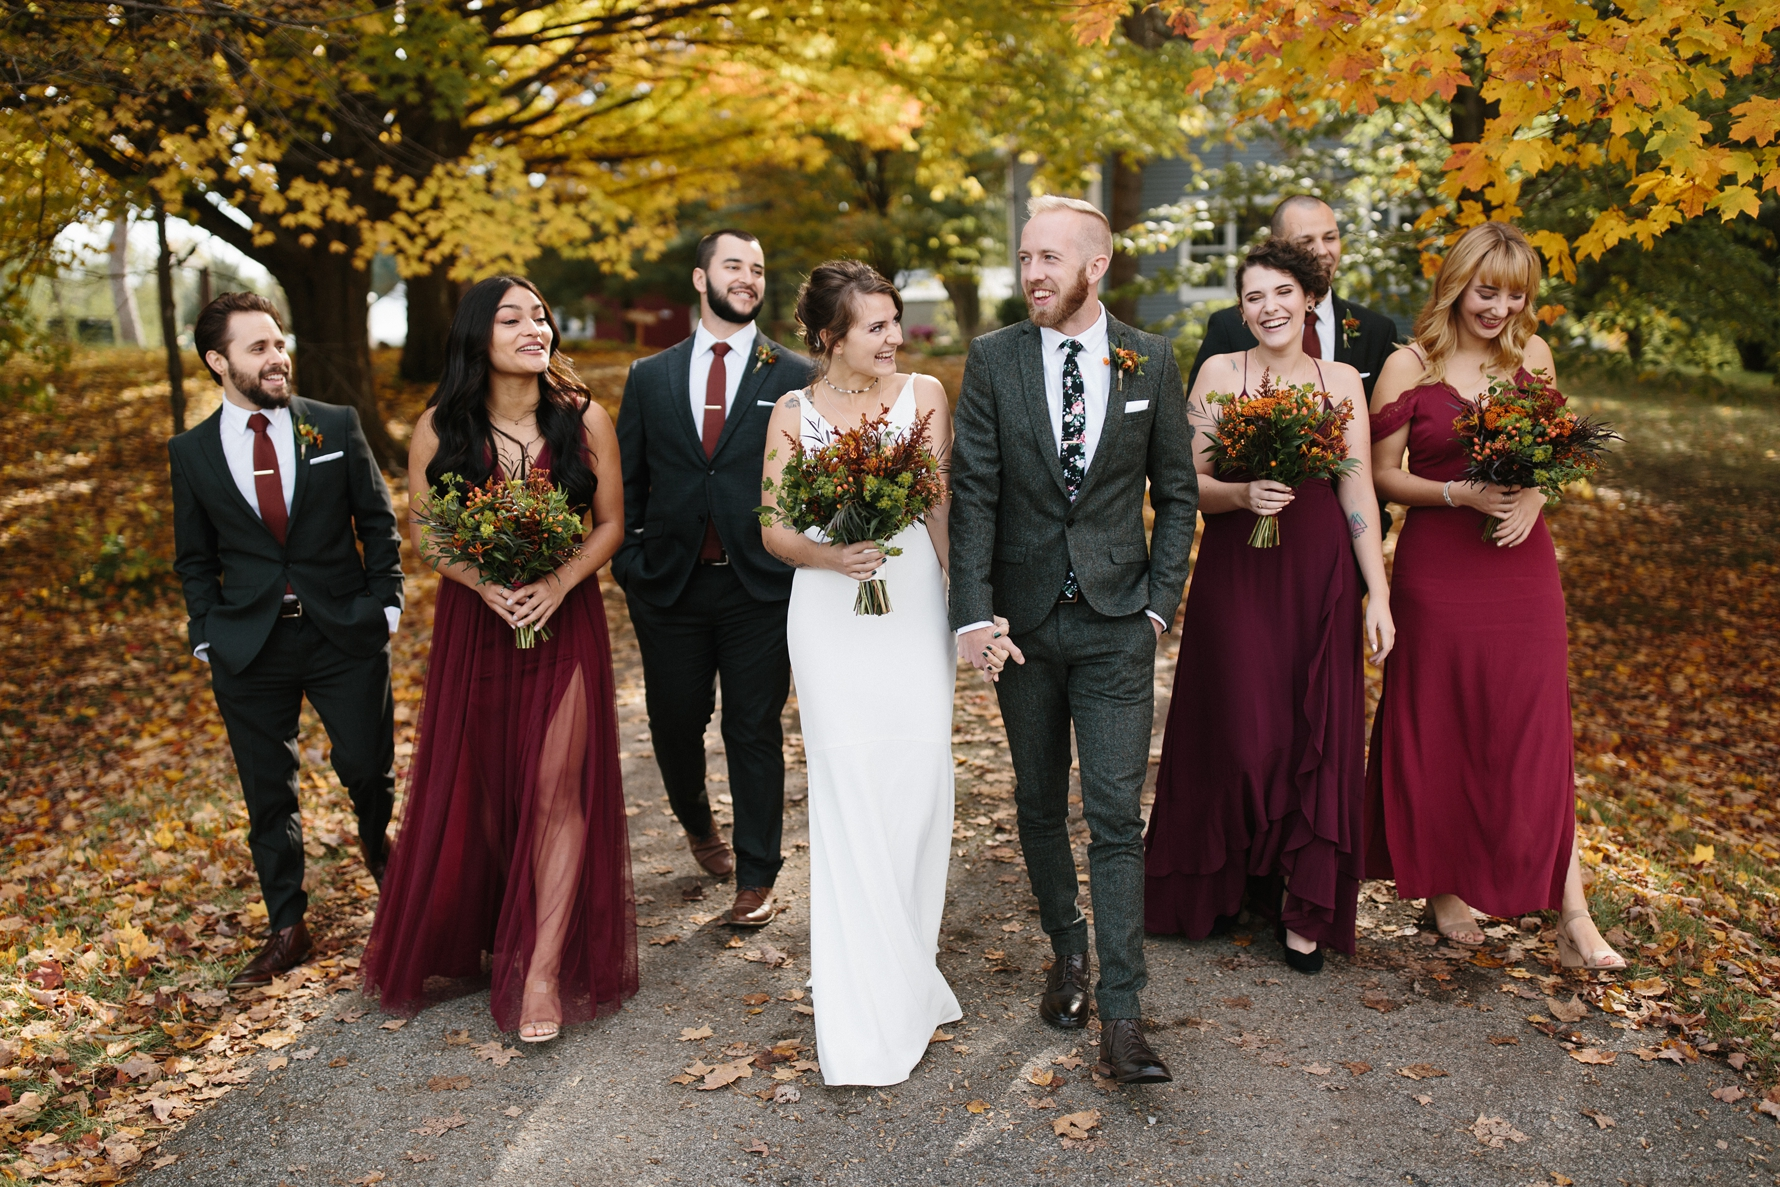 norris-traverse-city-wedding-23.JPG